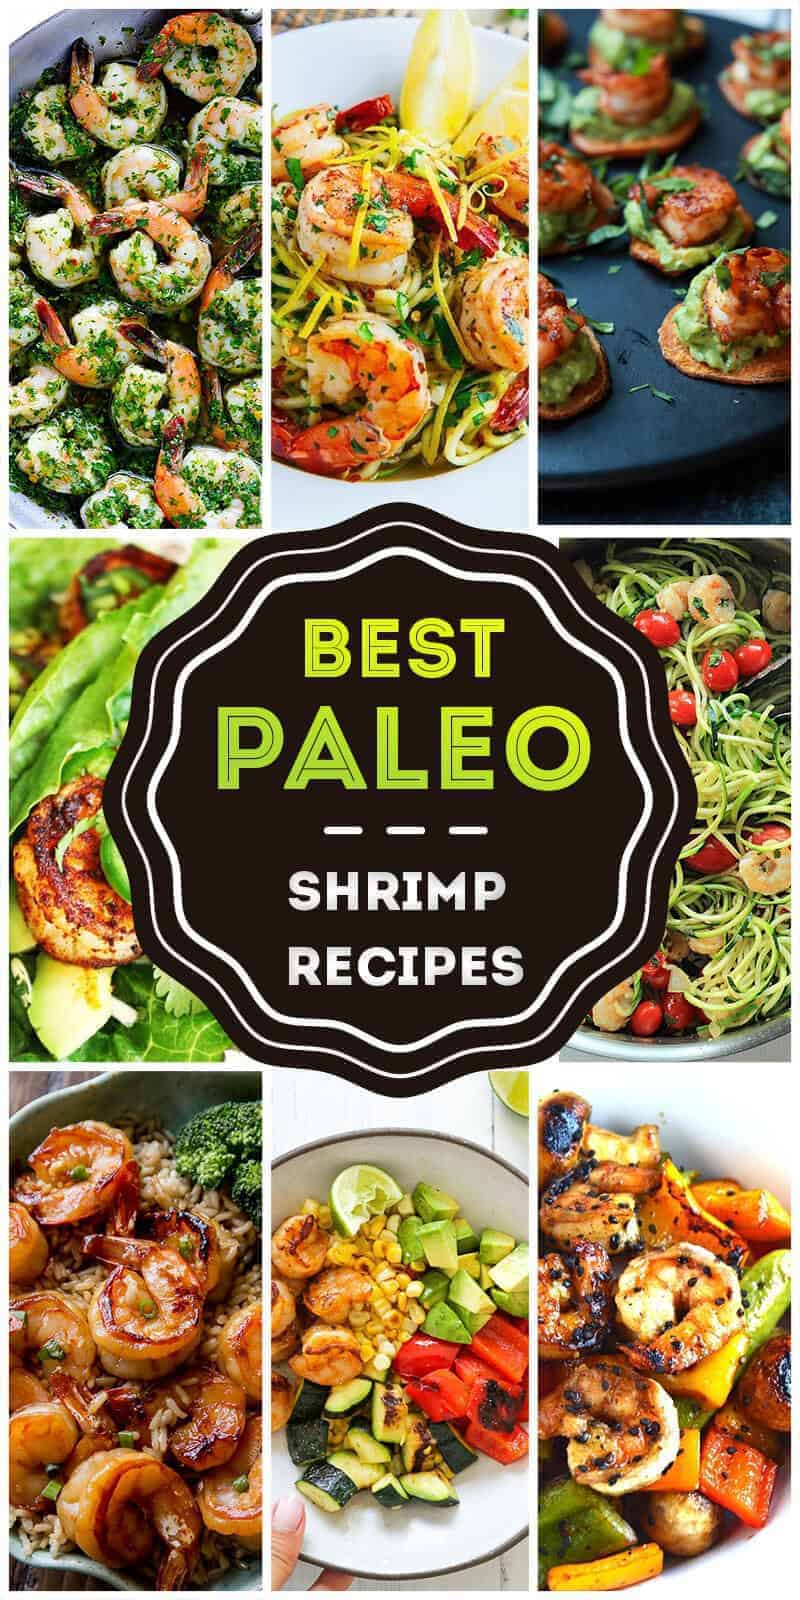 Paleo Shrimps